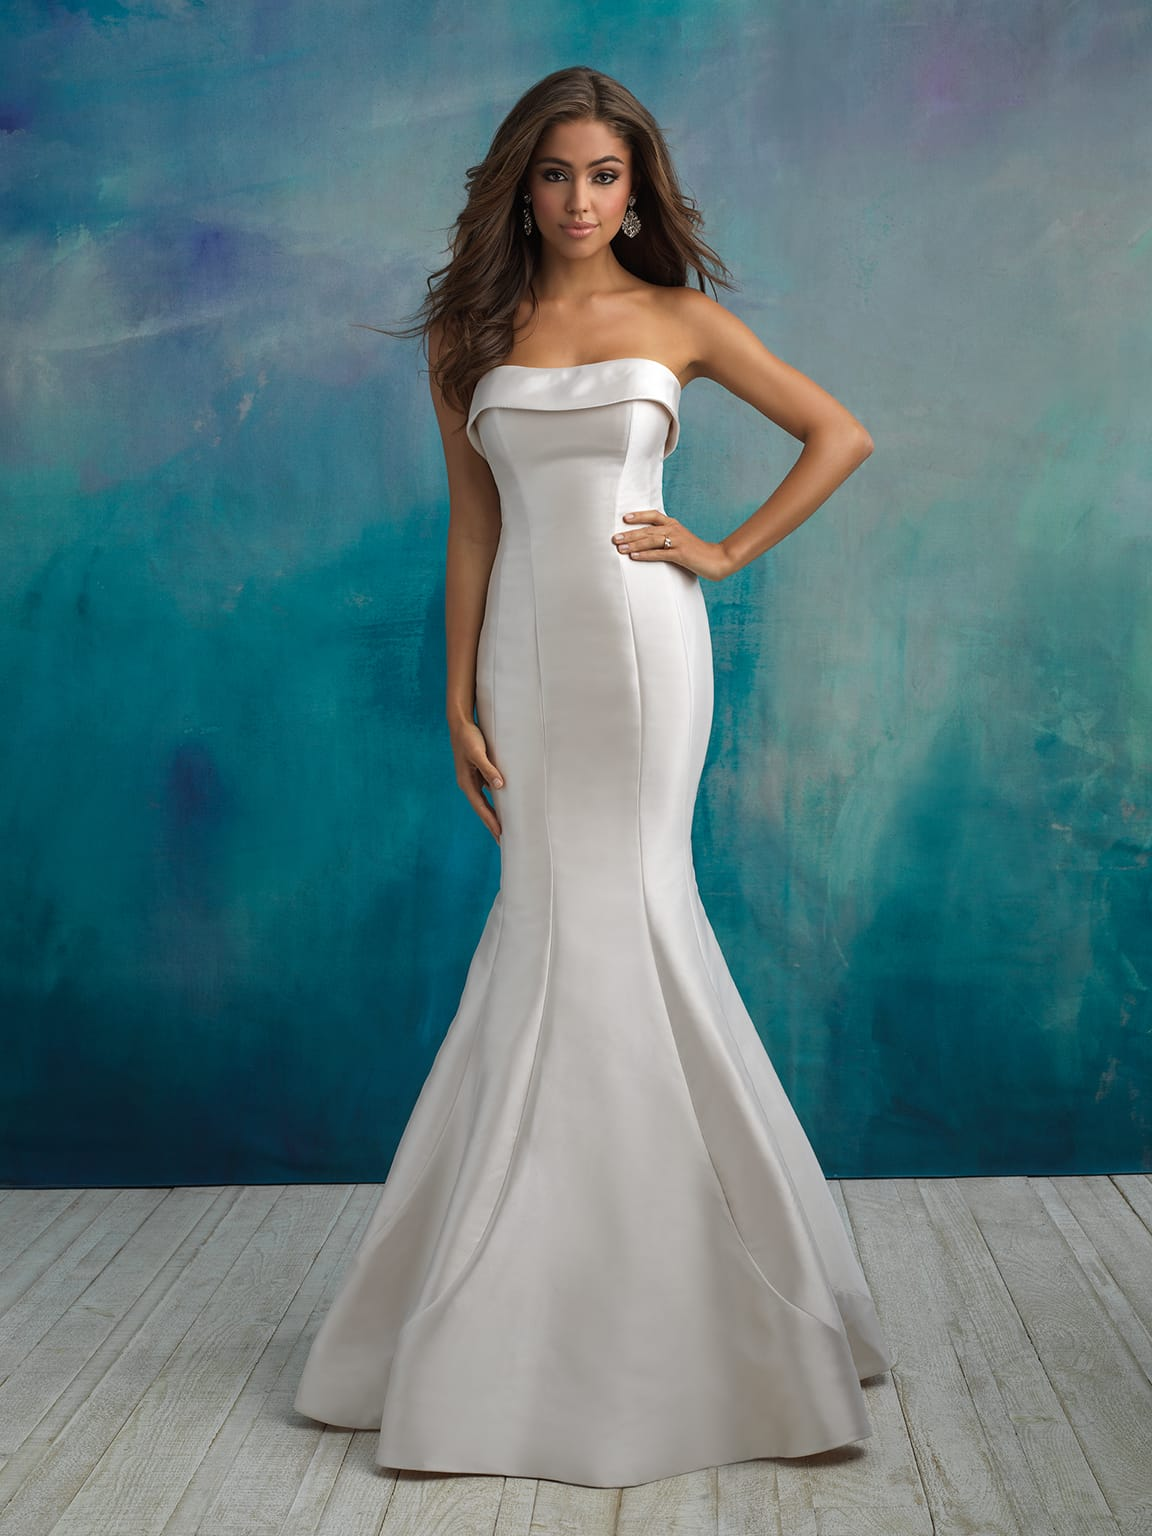 de25850cf623 Allure Bridal 9514 wedding dress - Sell My Wedding Dress Online ...